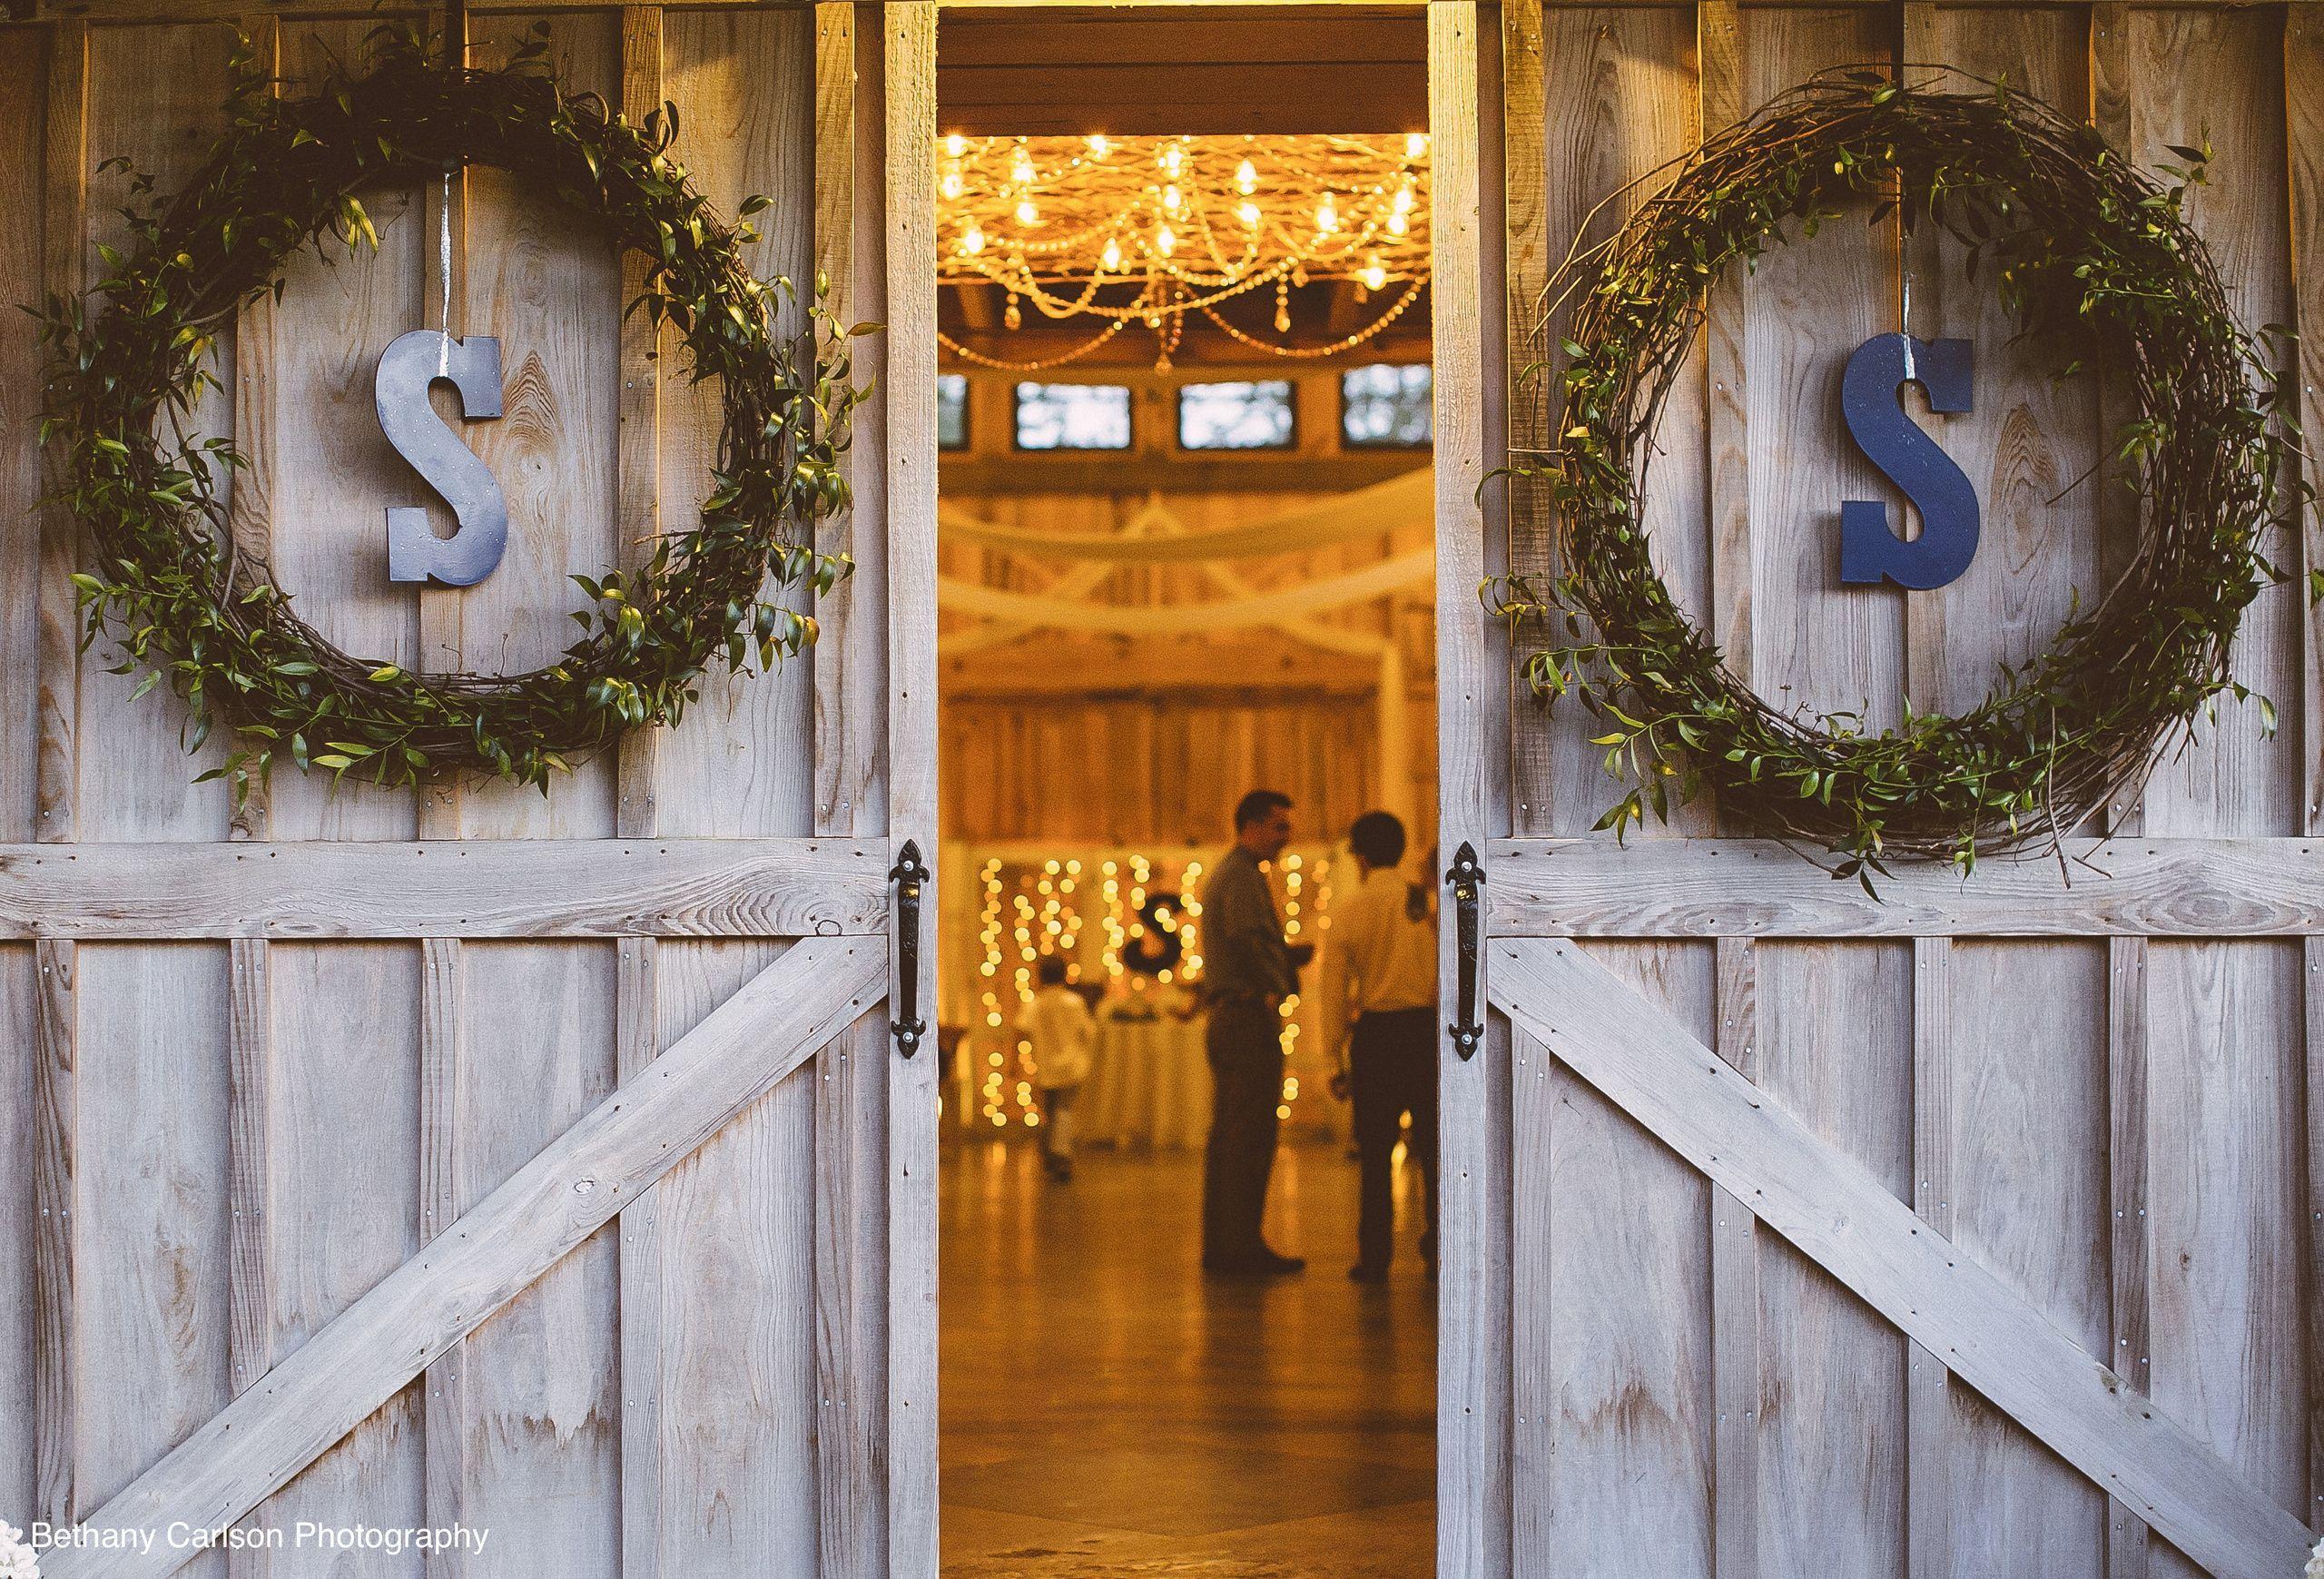 Wedding venue in Mobile, Alabama. Saraland Alabama event